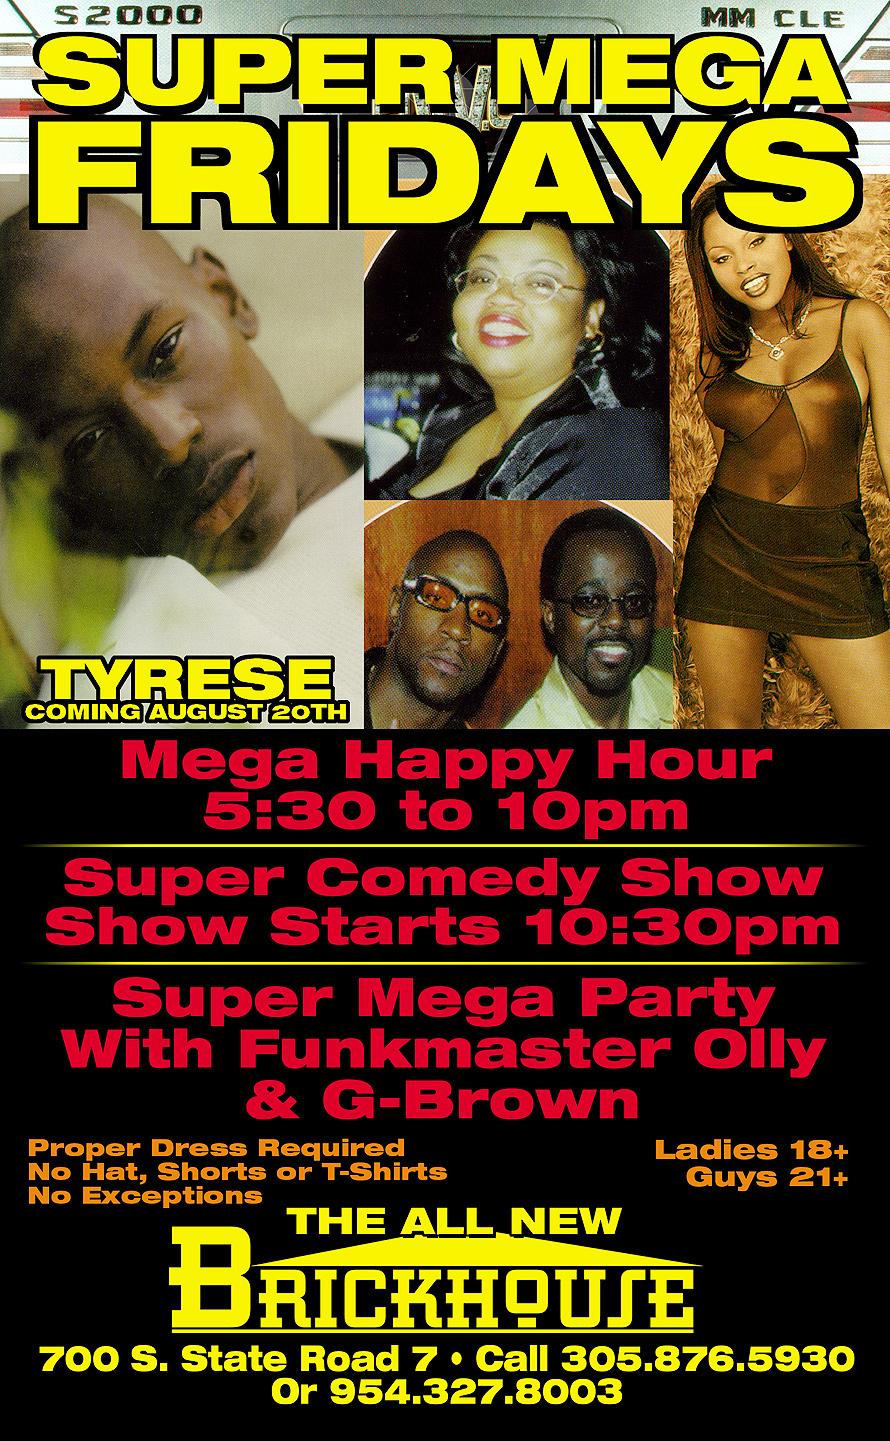 Super Mega Fridays at Brickhouse with Tyrese